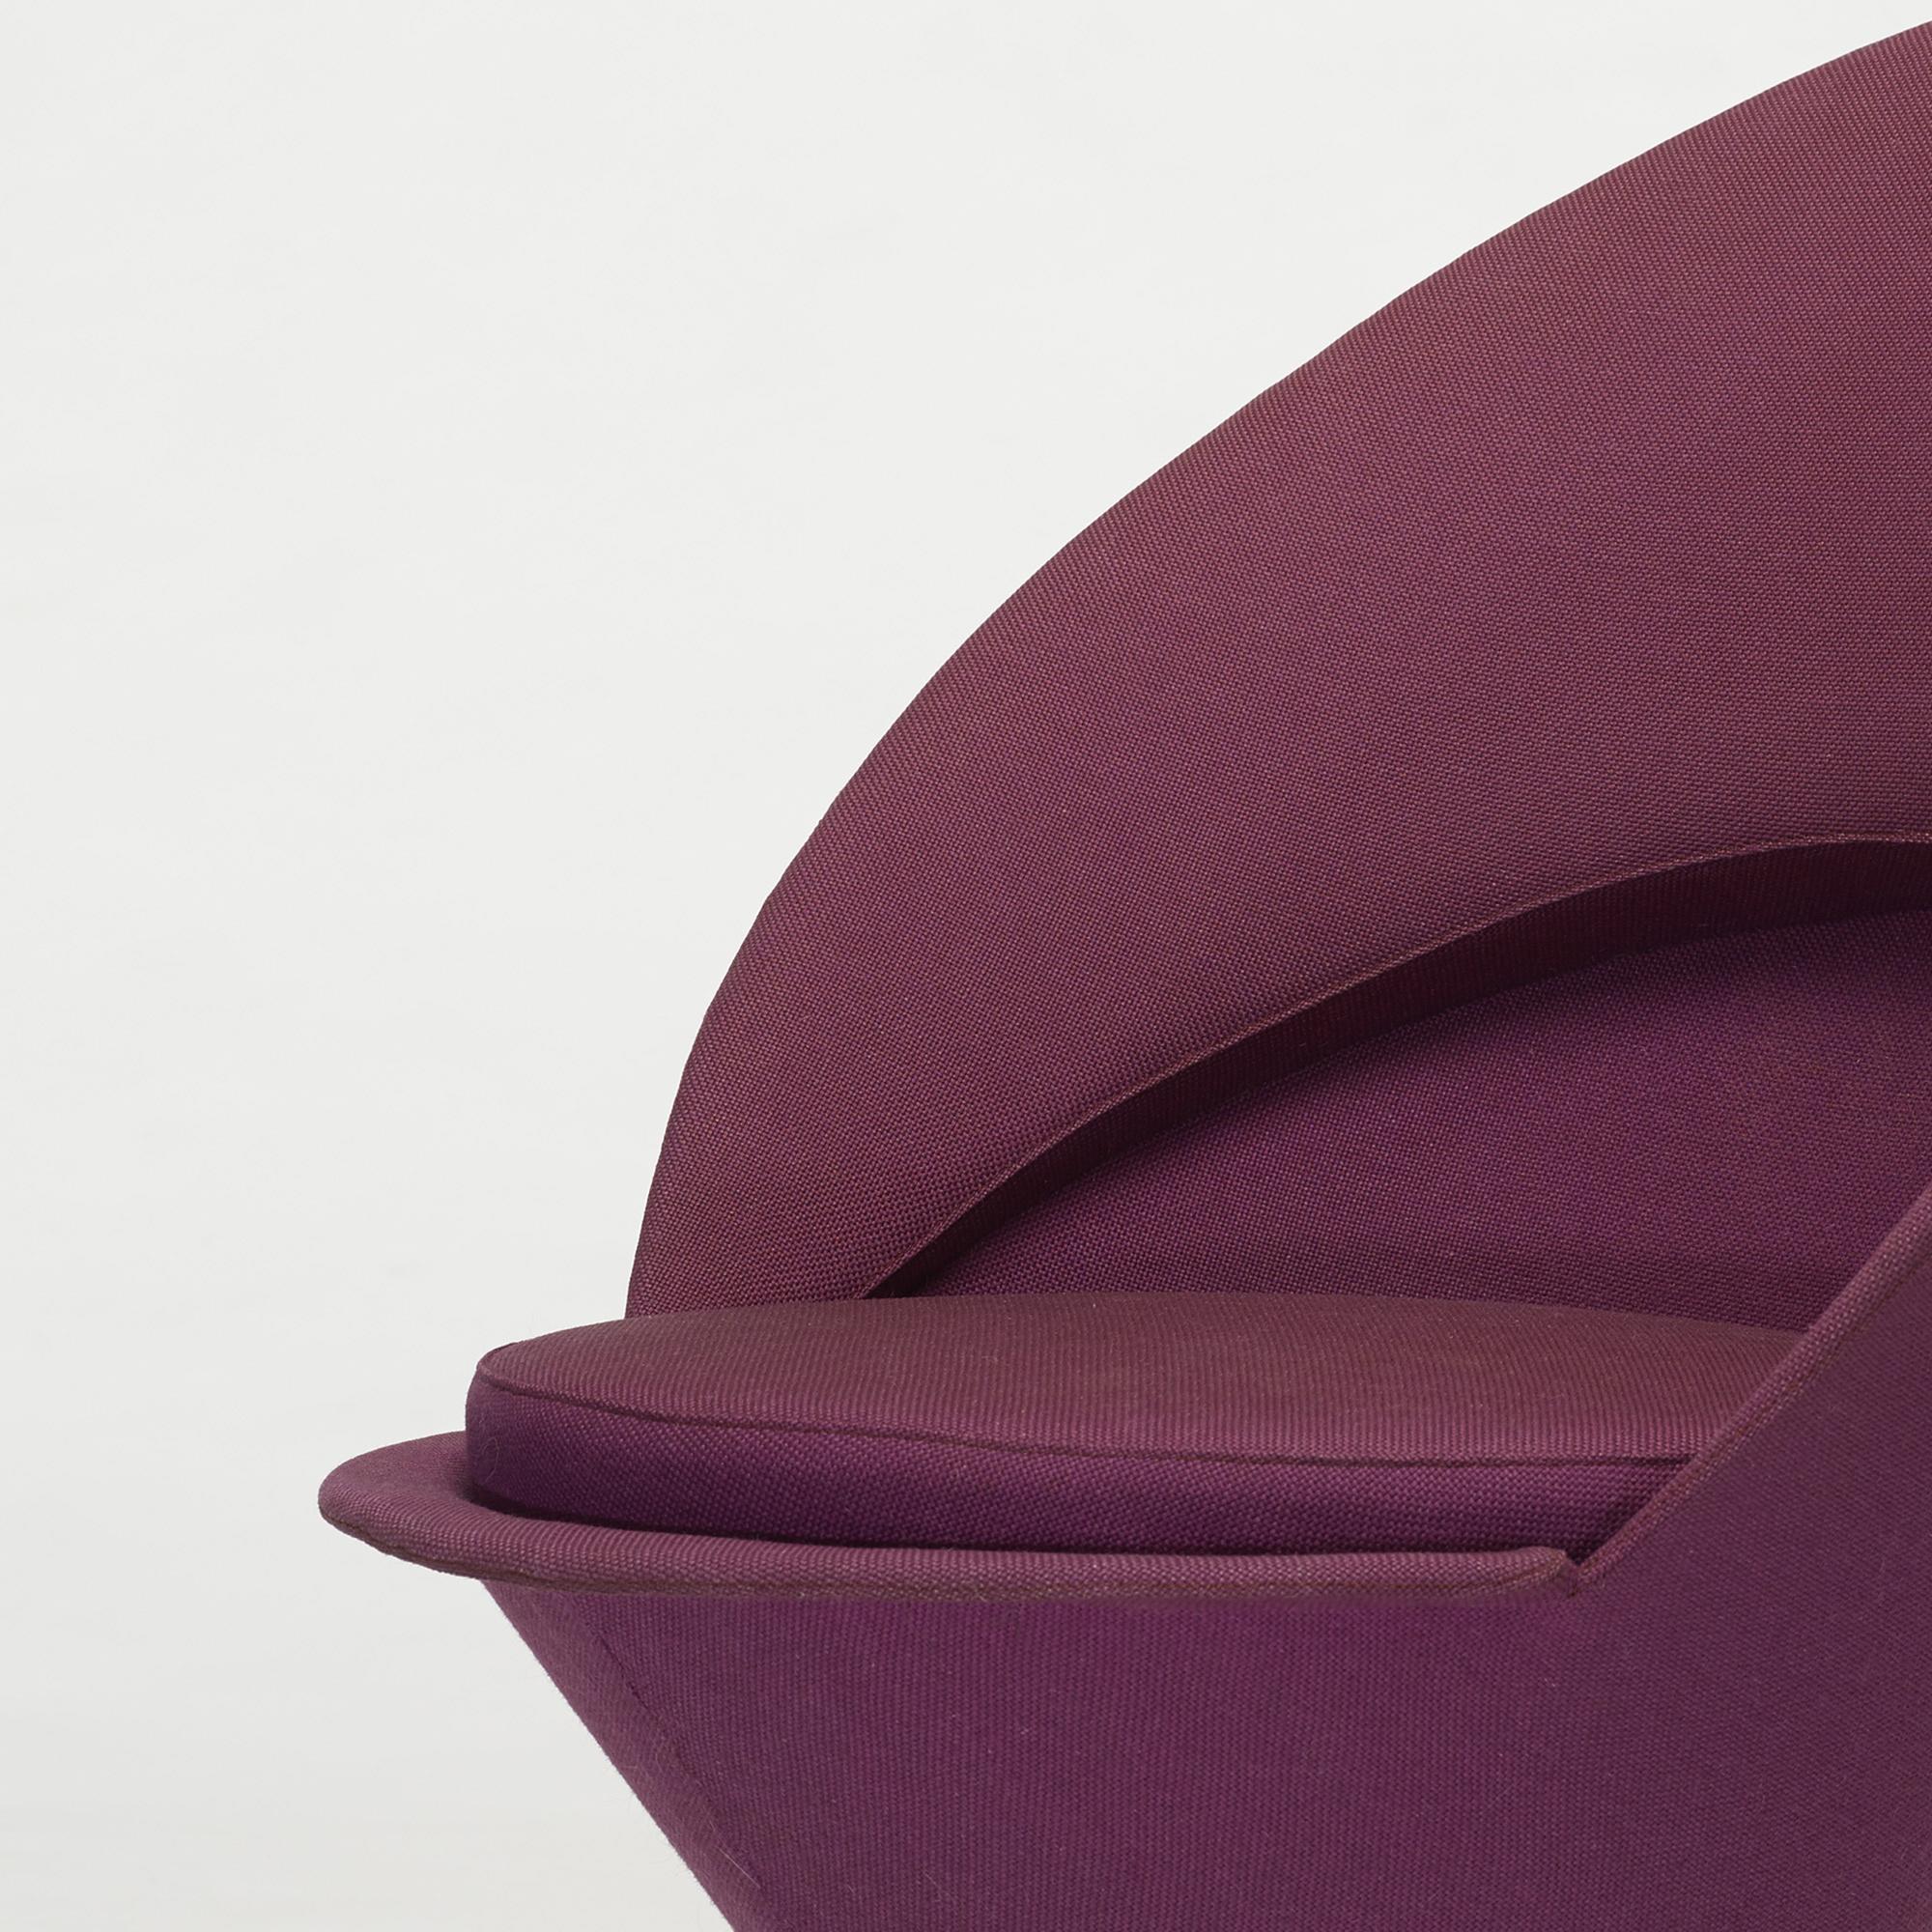 648: Verner Panton / Cone chair (4 of 4)